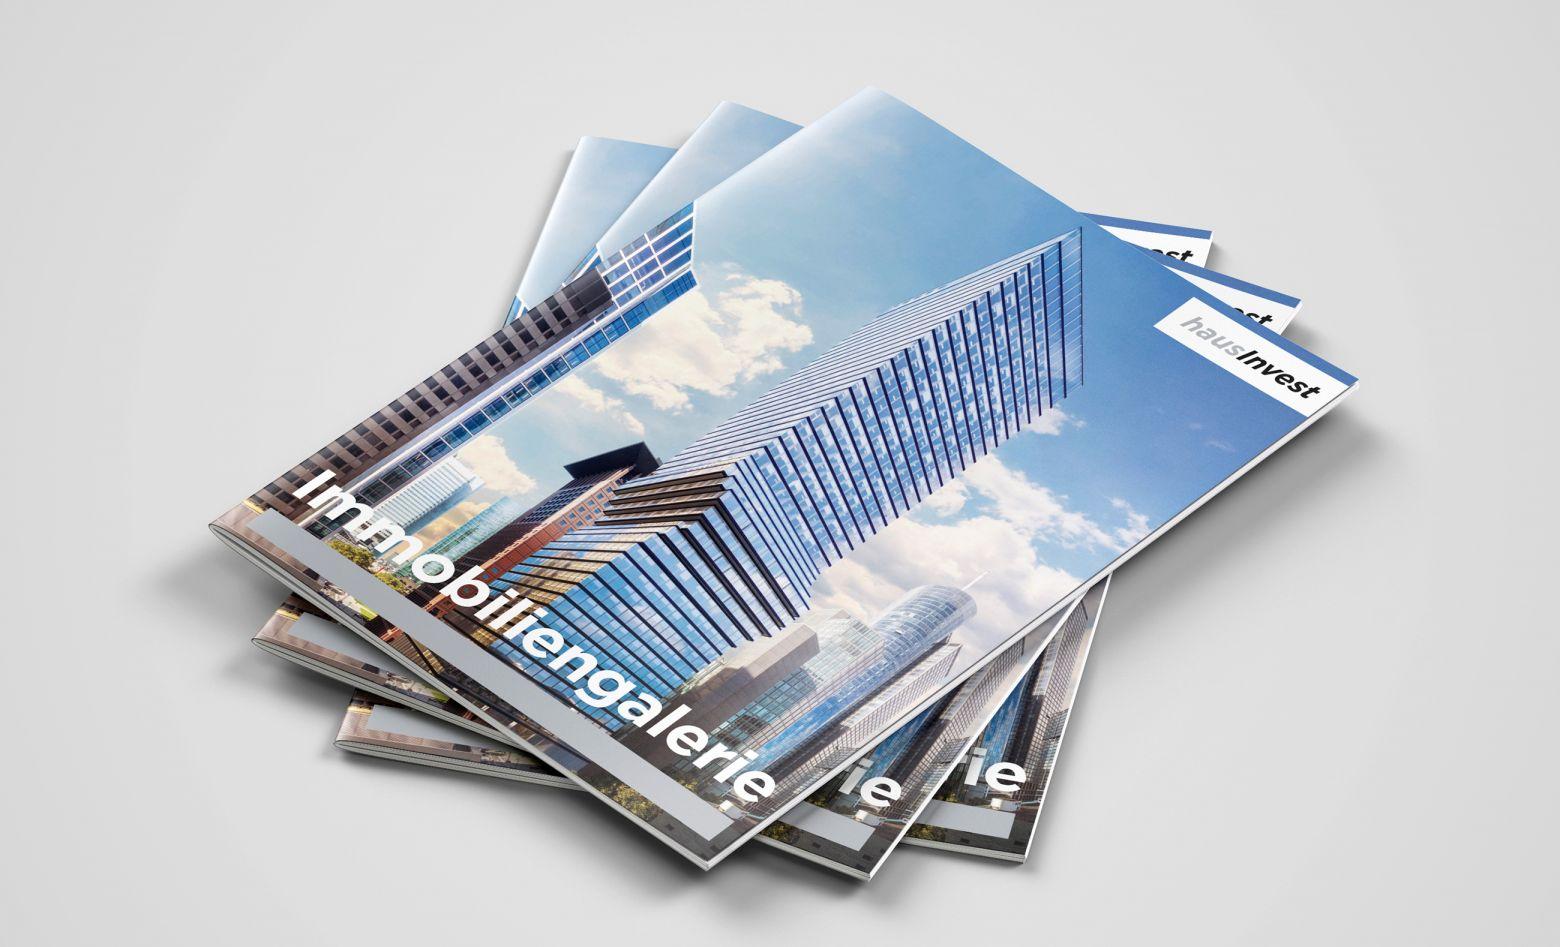 hausinvest_Immobiliengalerie Cover